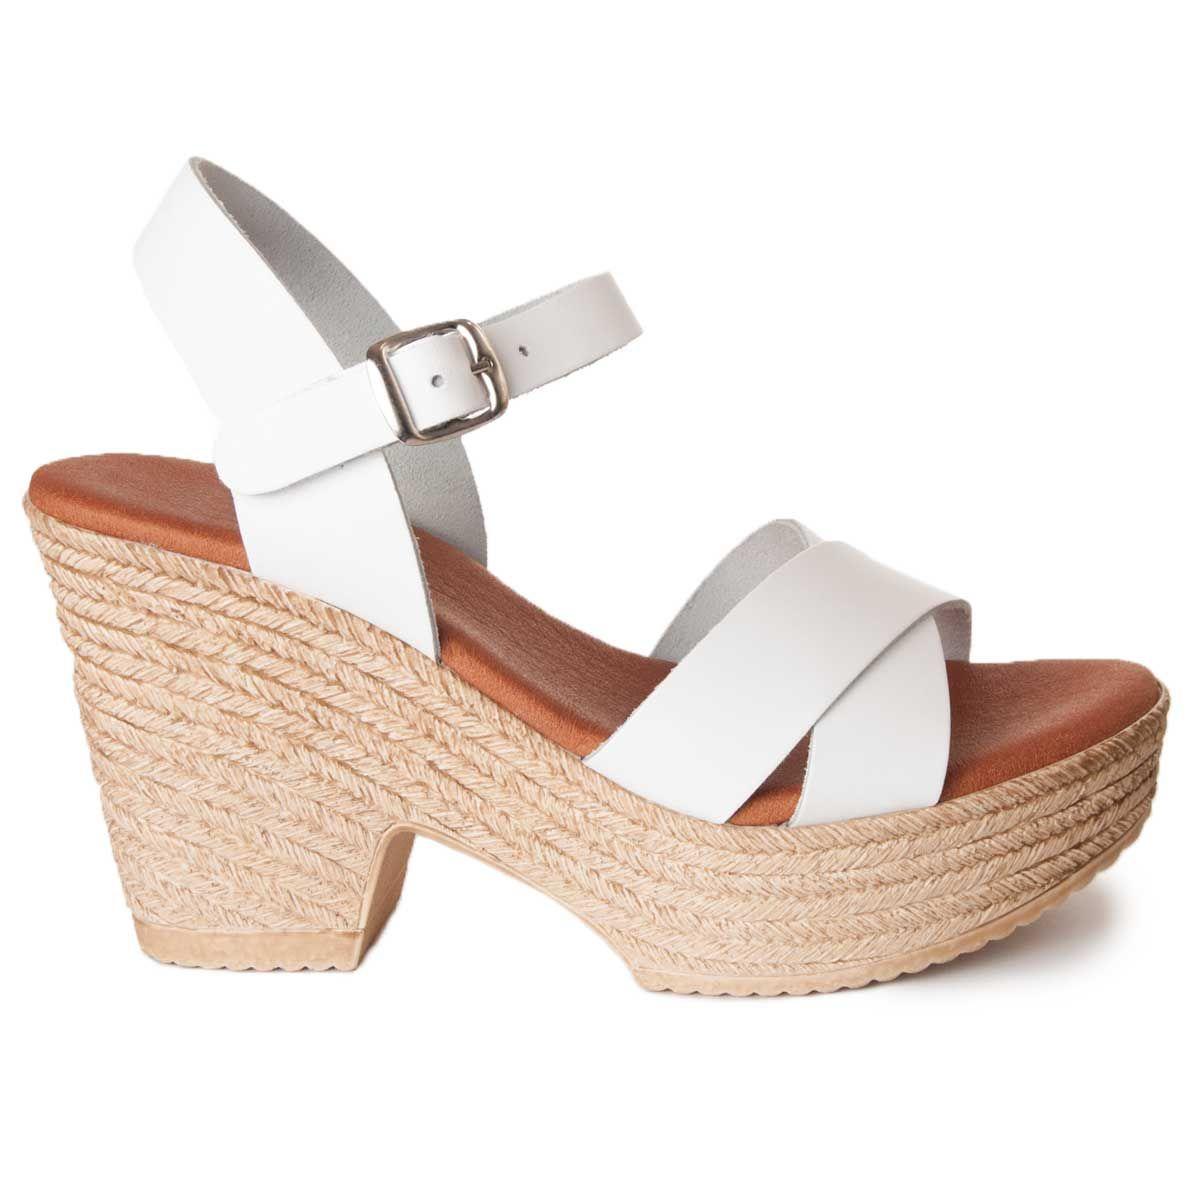 Leindia Platform Sandal in White